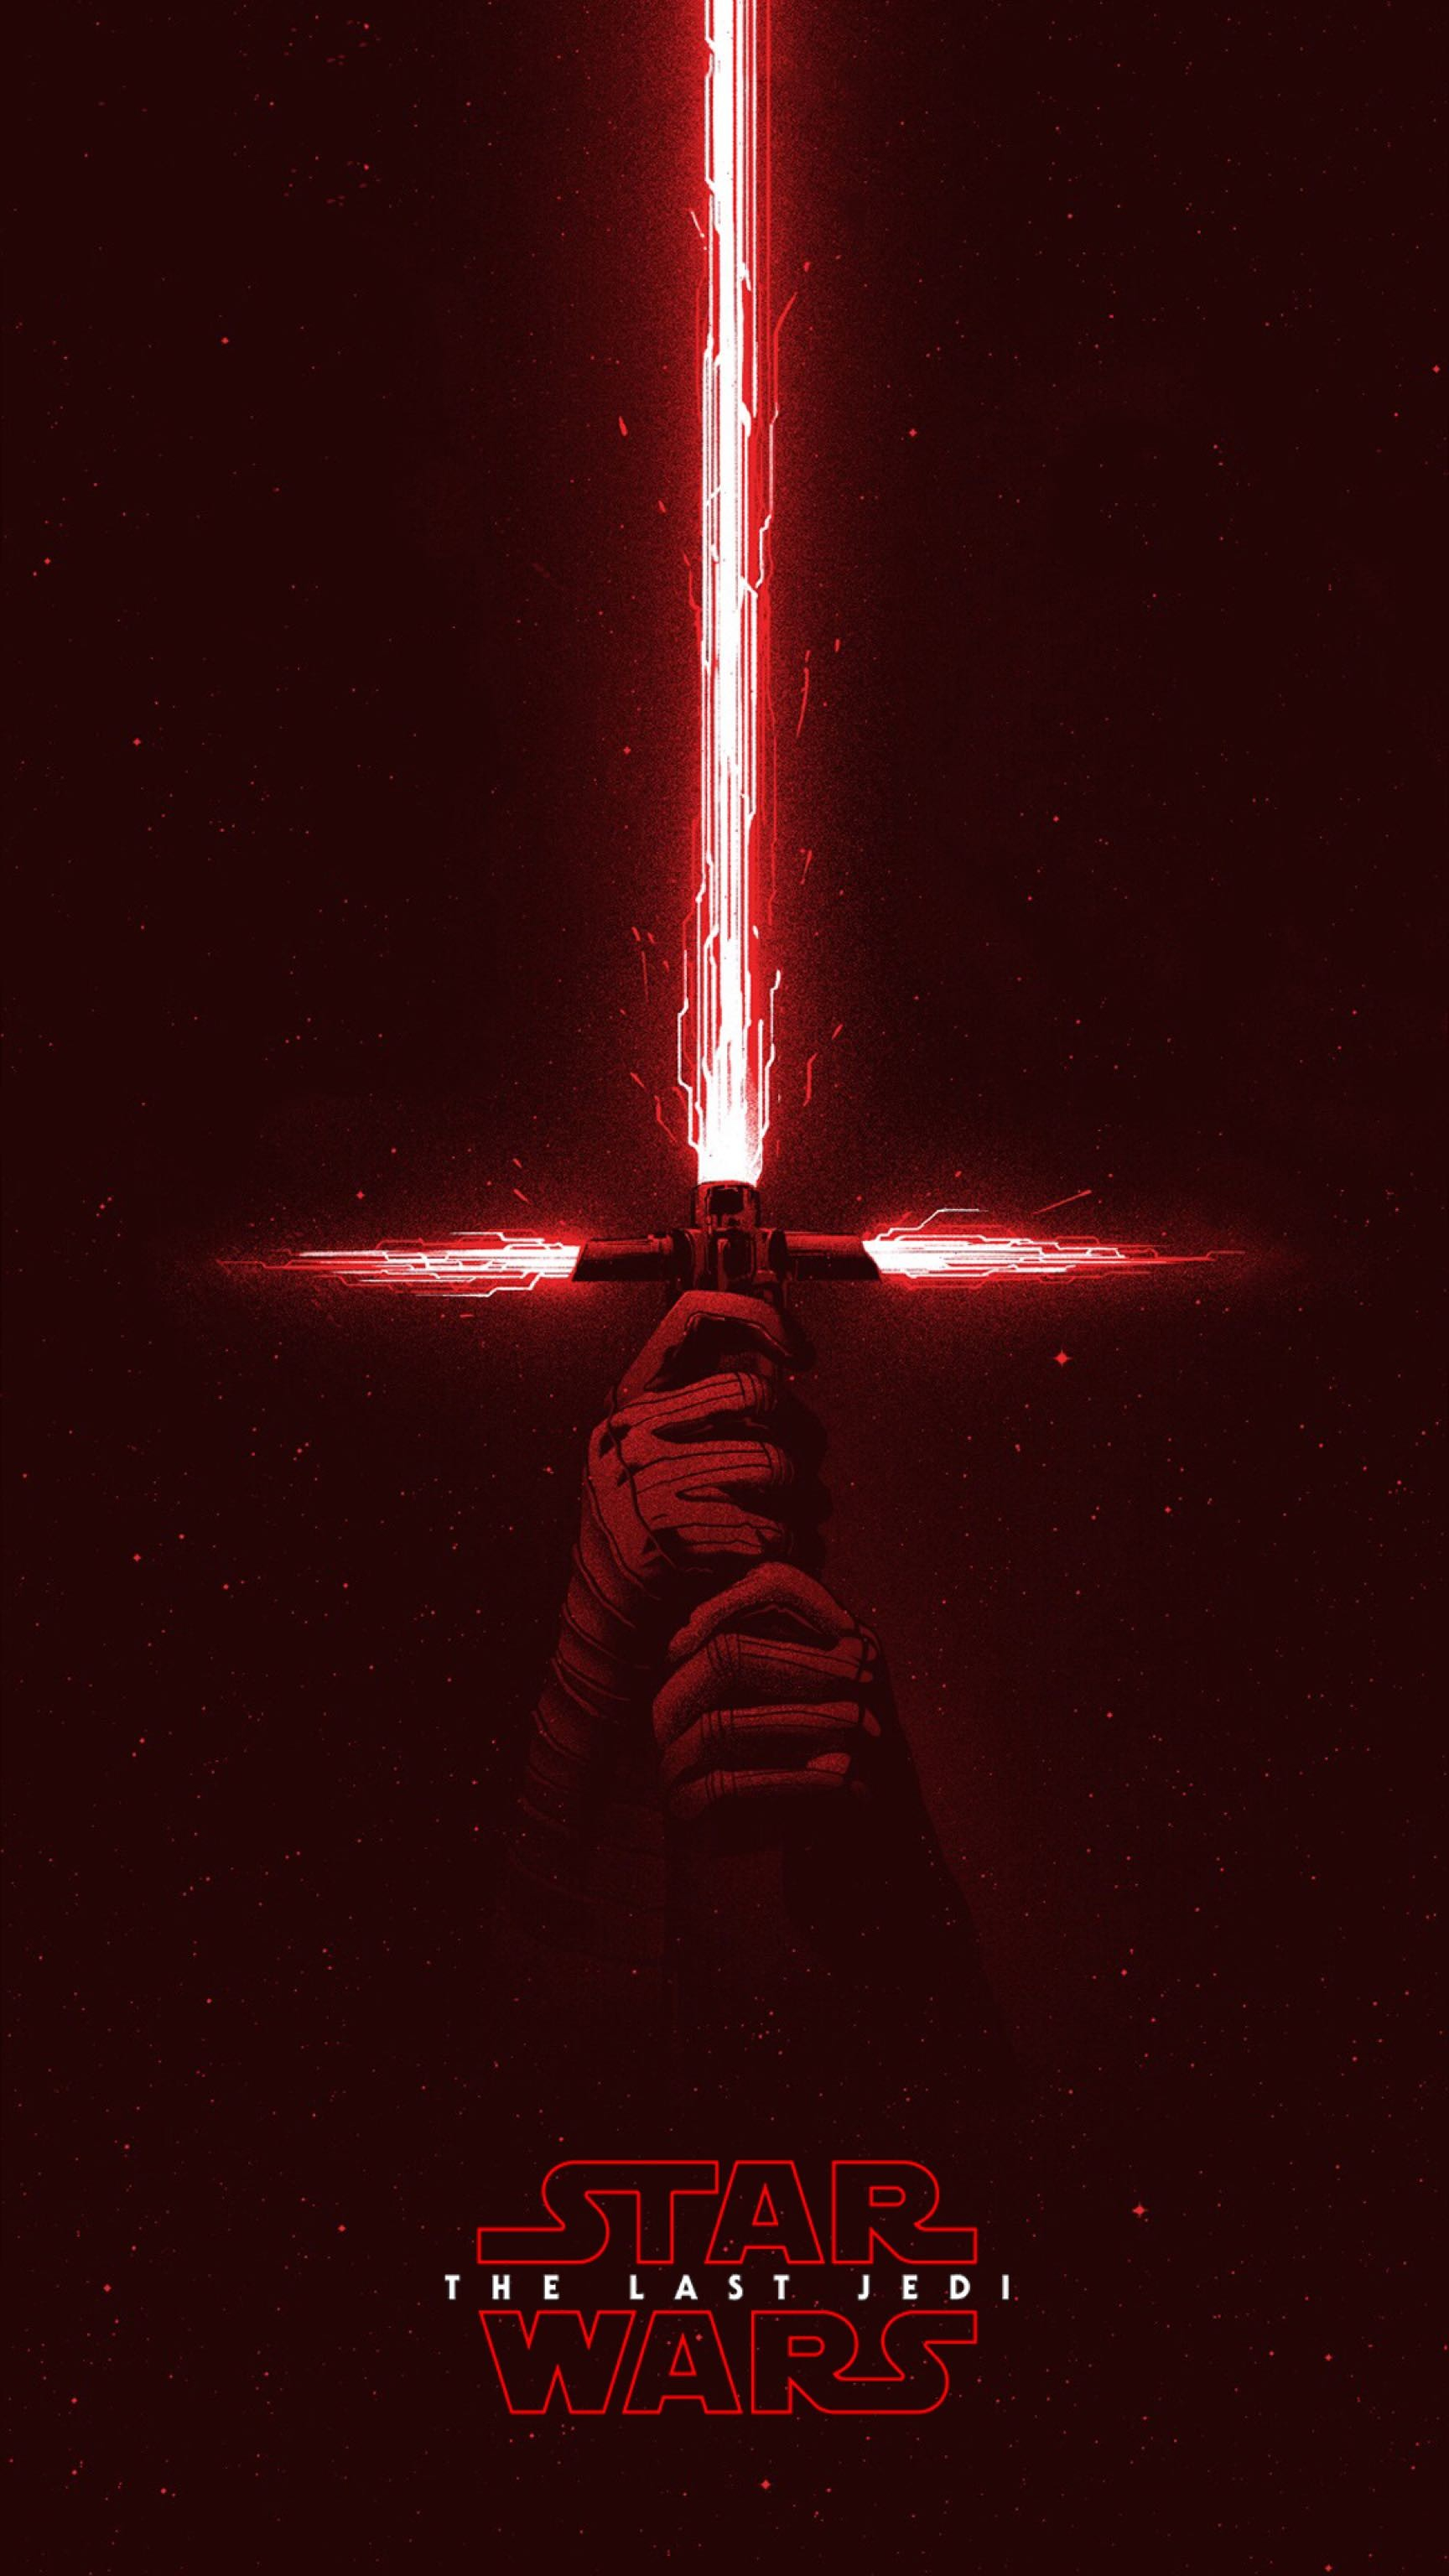 The Last Jedi Kylo Ren…heaven help us if he's the last Jedi